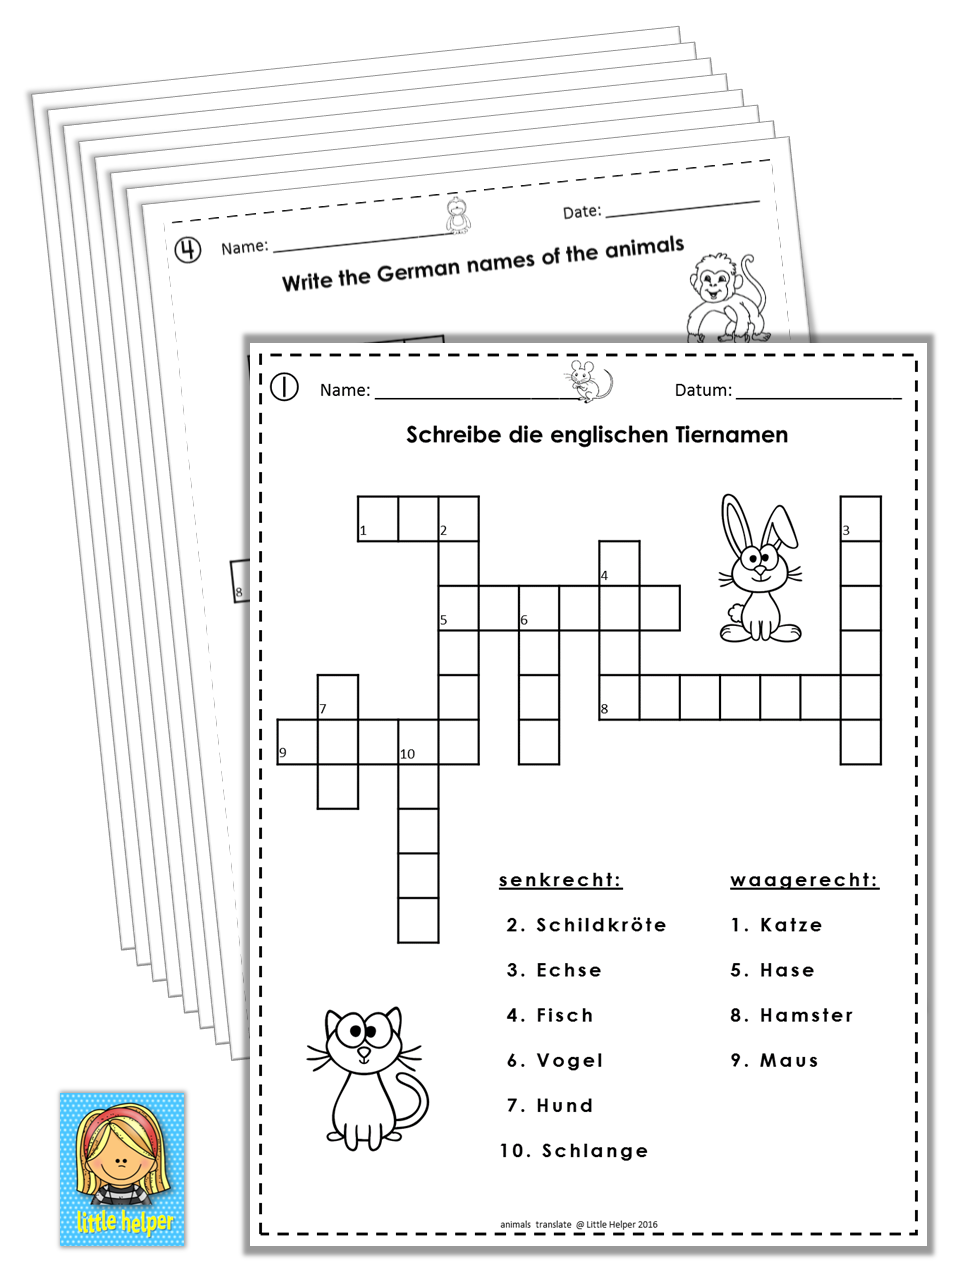 german english crossword puzzles tiere animals german english german words and english words. Black Bedroom Furniture Sets. Home Design Ideas